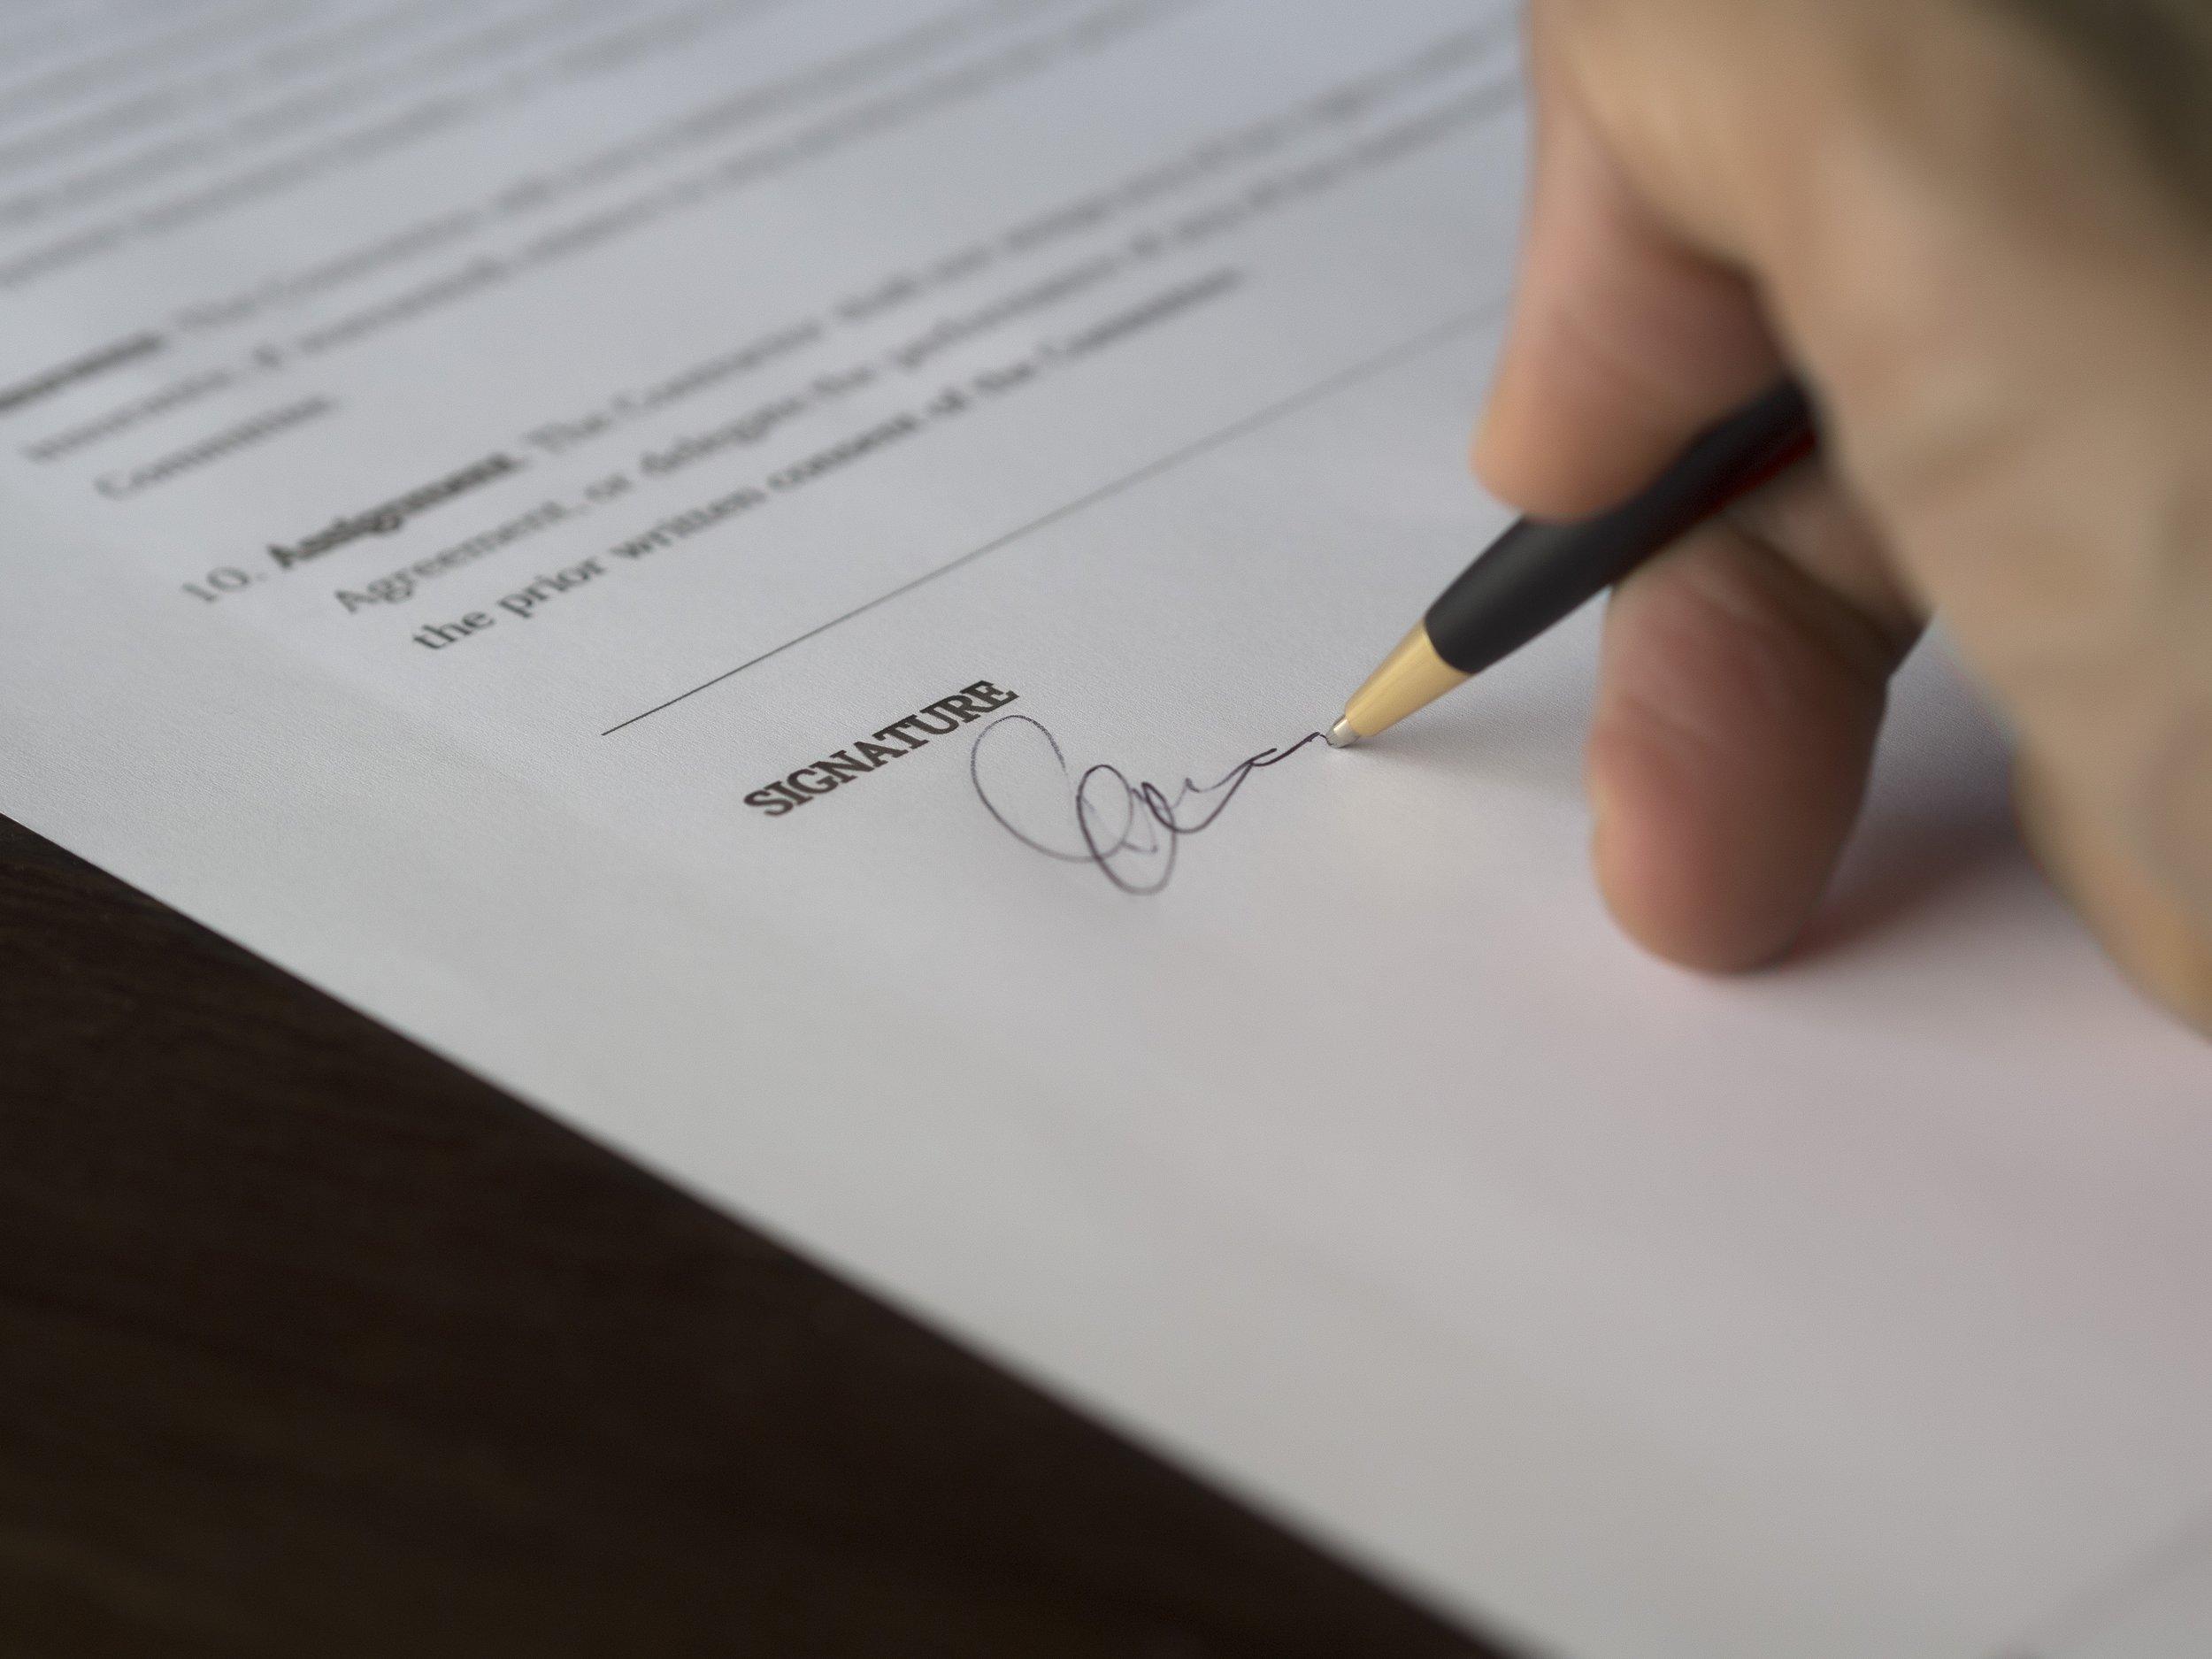 009.Signing.jpeg